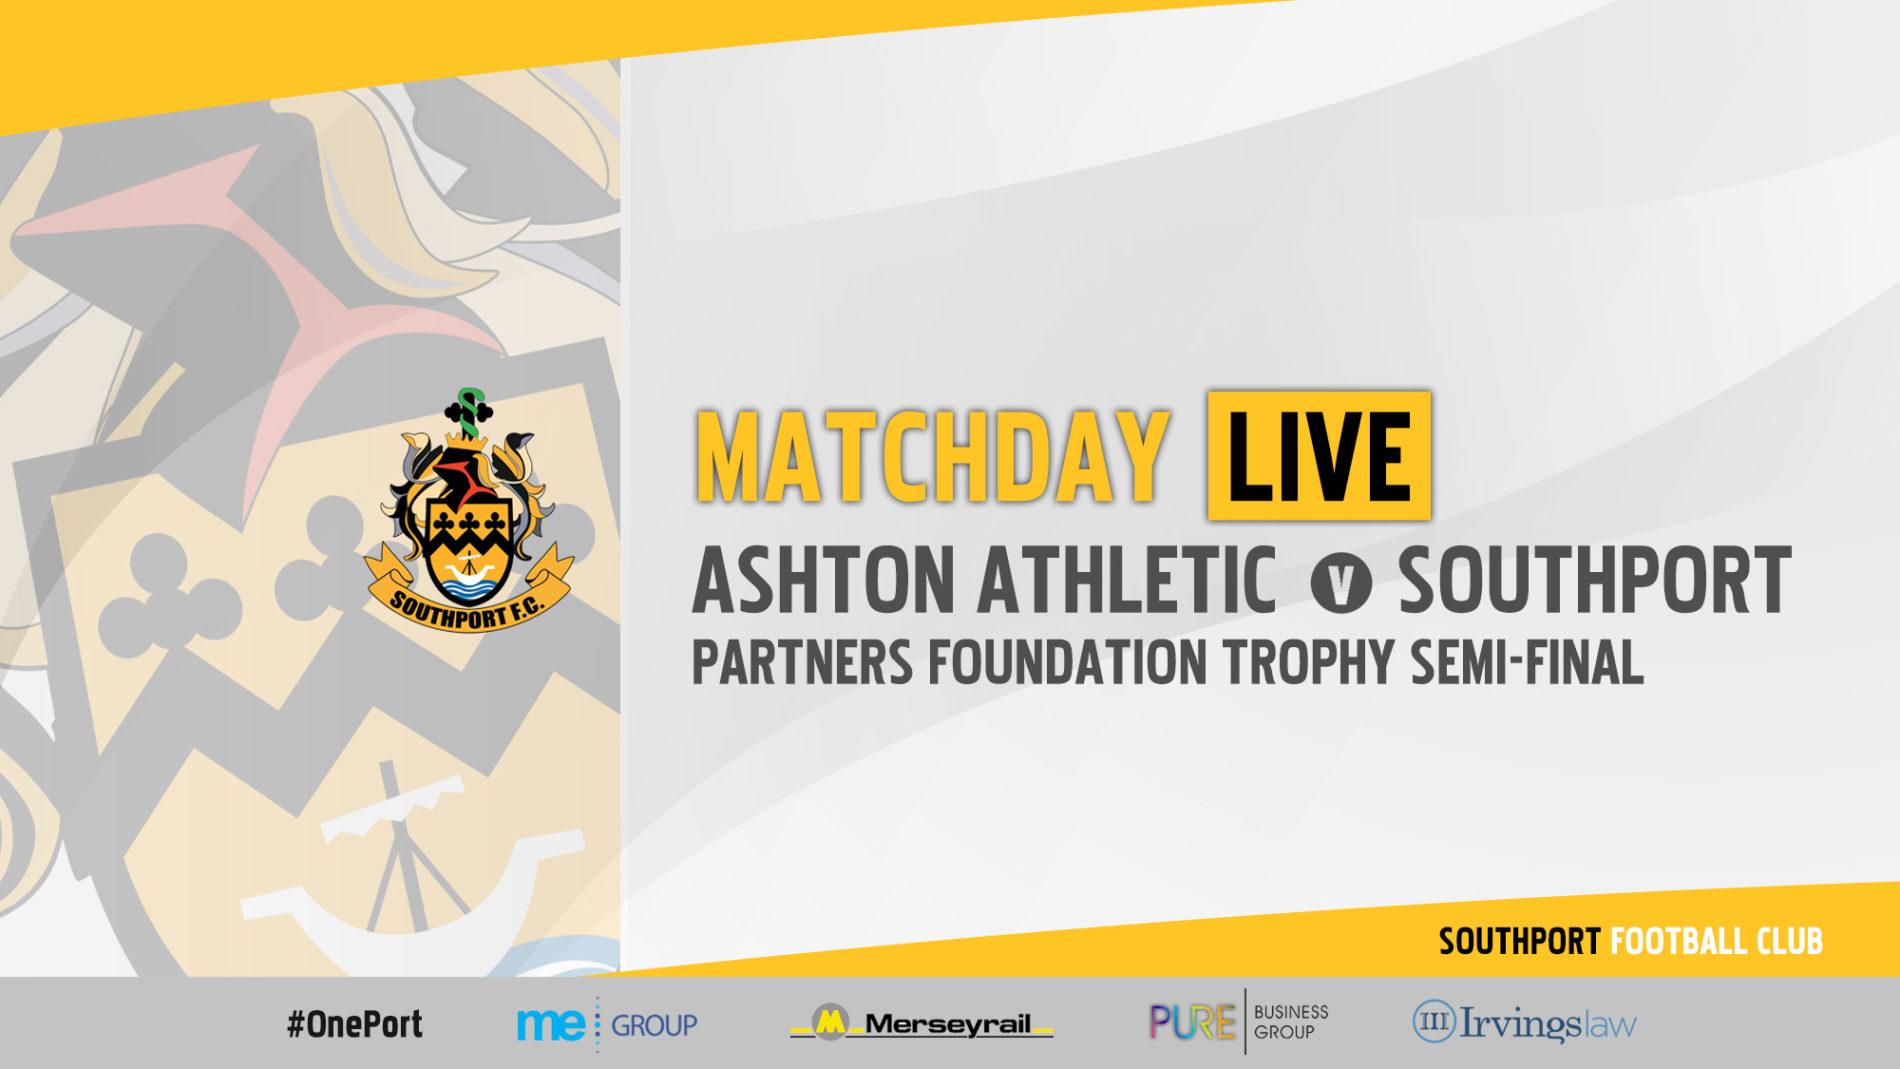 MATCHDAY LIVE | Ashton Athletic vs Southport – Challenge Trophy Semi Final